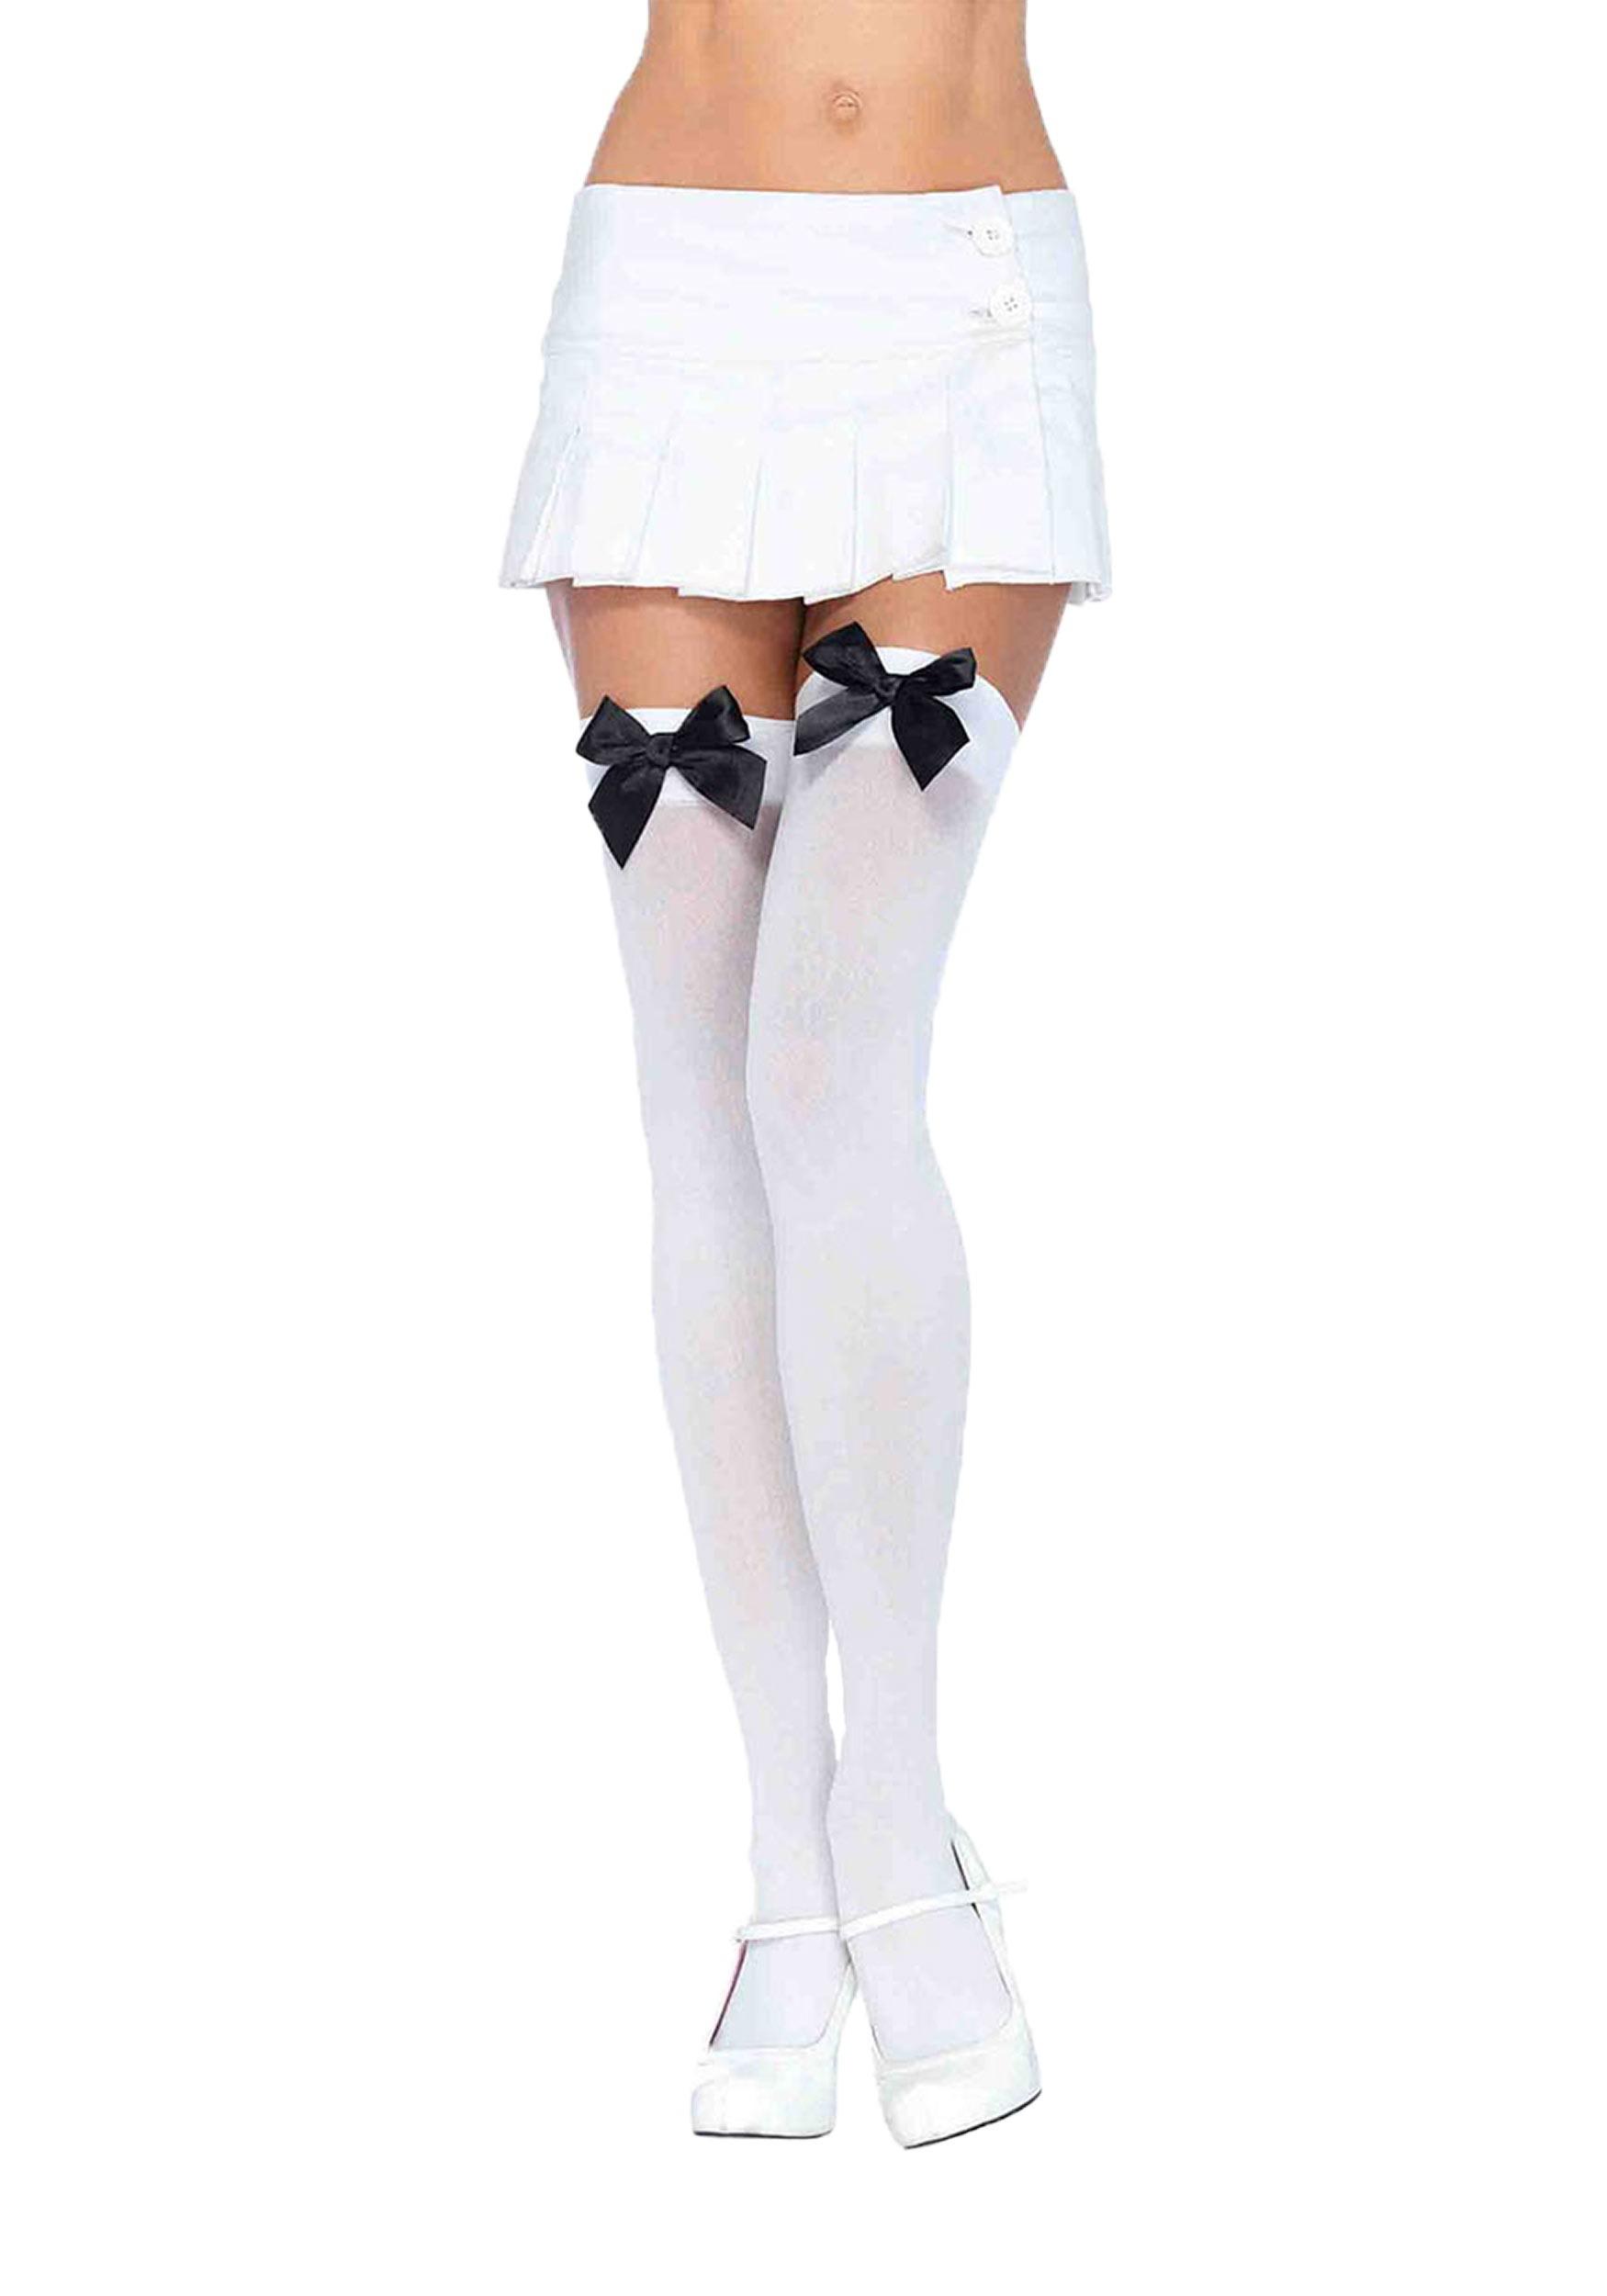 Sexy white tights